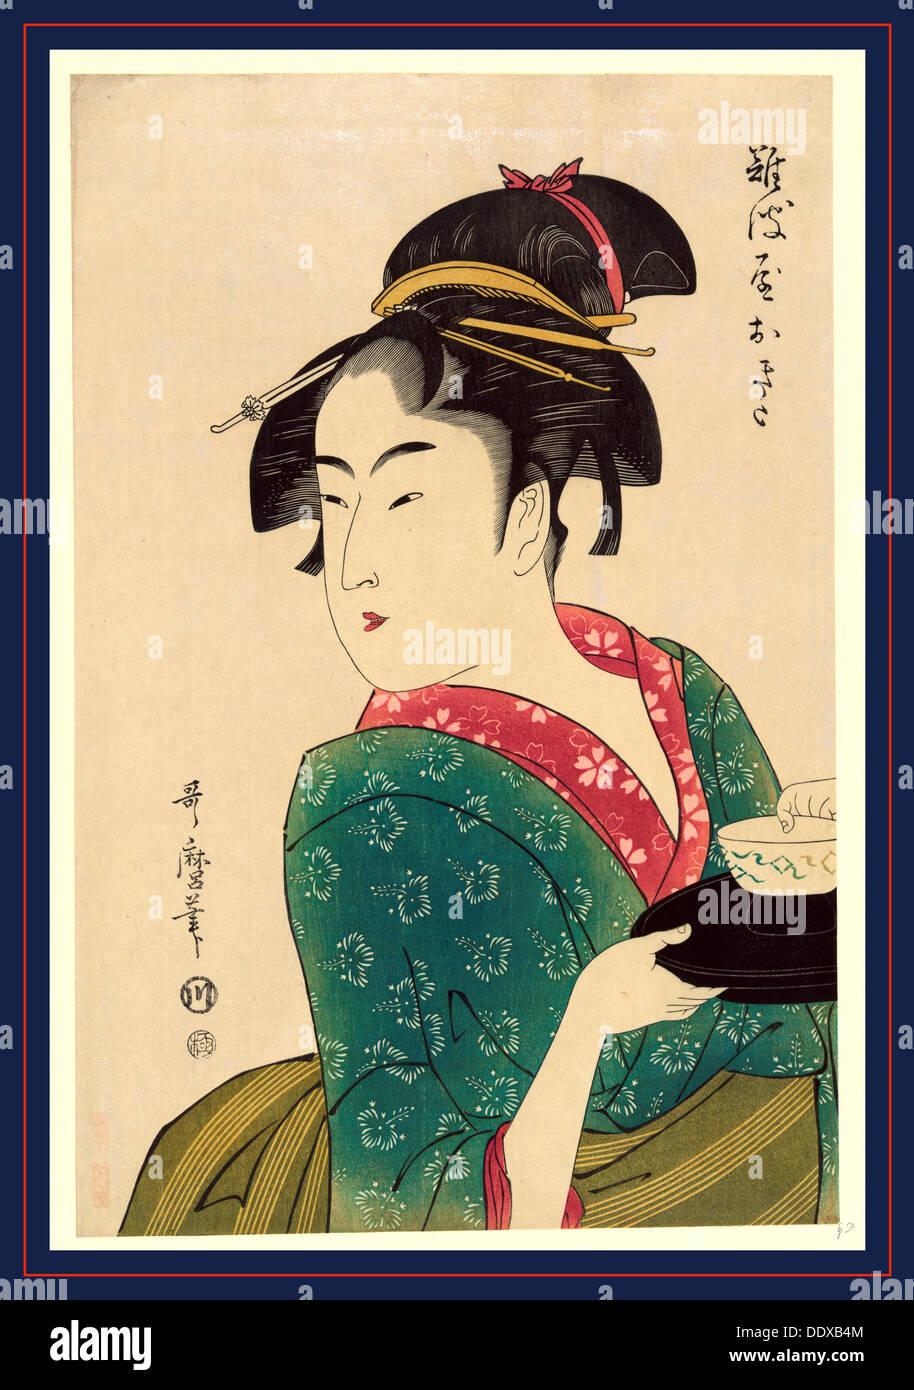 Naniwaya okita, Okita de Naniwa-ya. [1793] Plus tard, imprimés, 1 tirage: gravure sur bois, couleur., Imprimer Banque D'Images